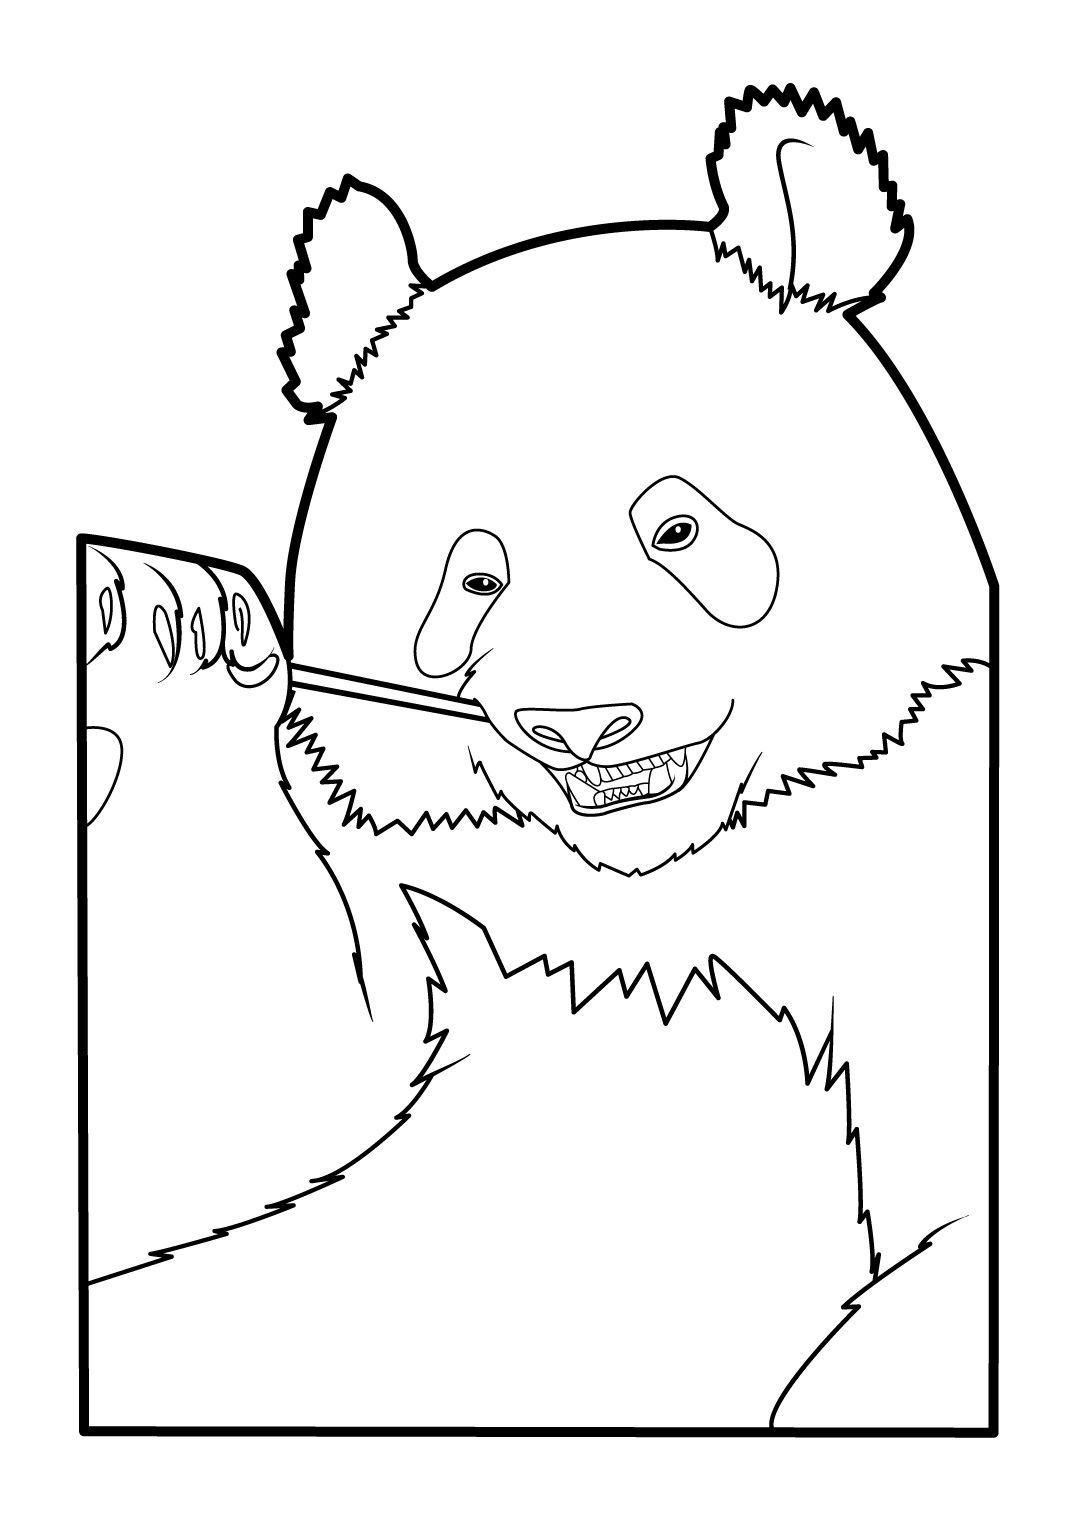 Coloriage Panda 15 - Coloriage Pandas - Coloriages Animaux